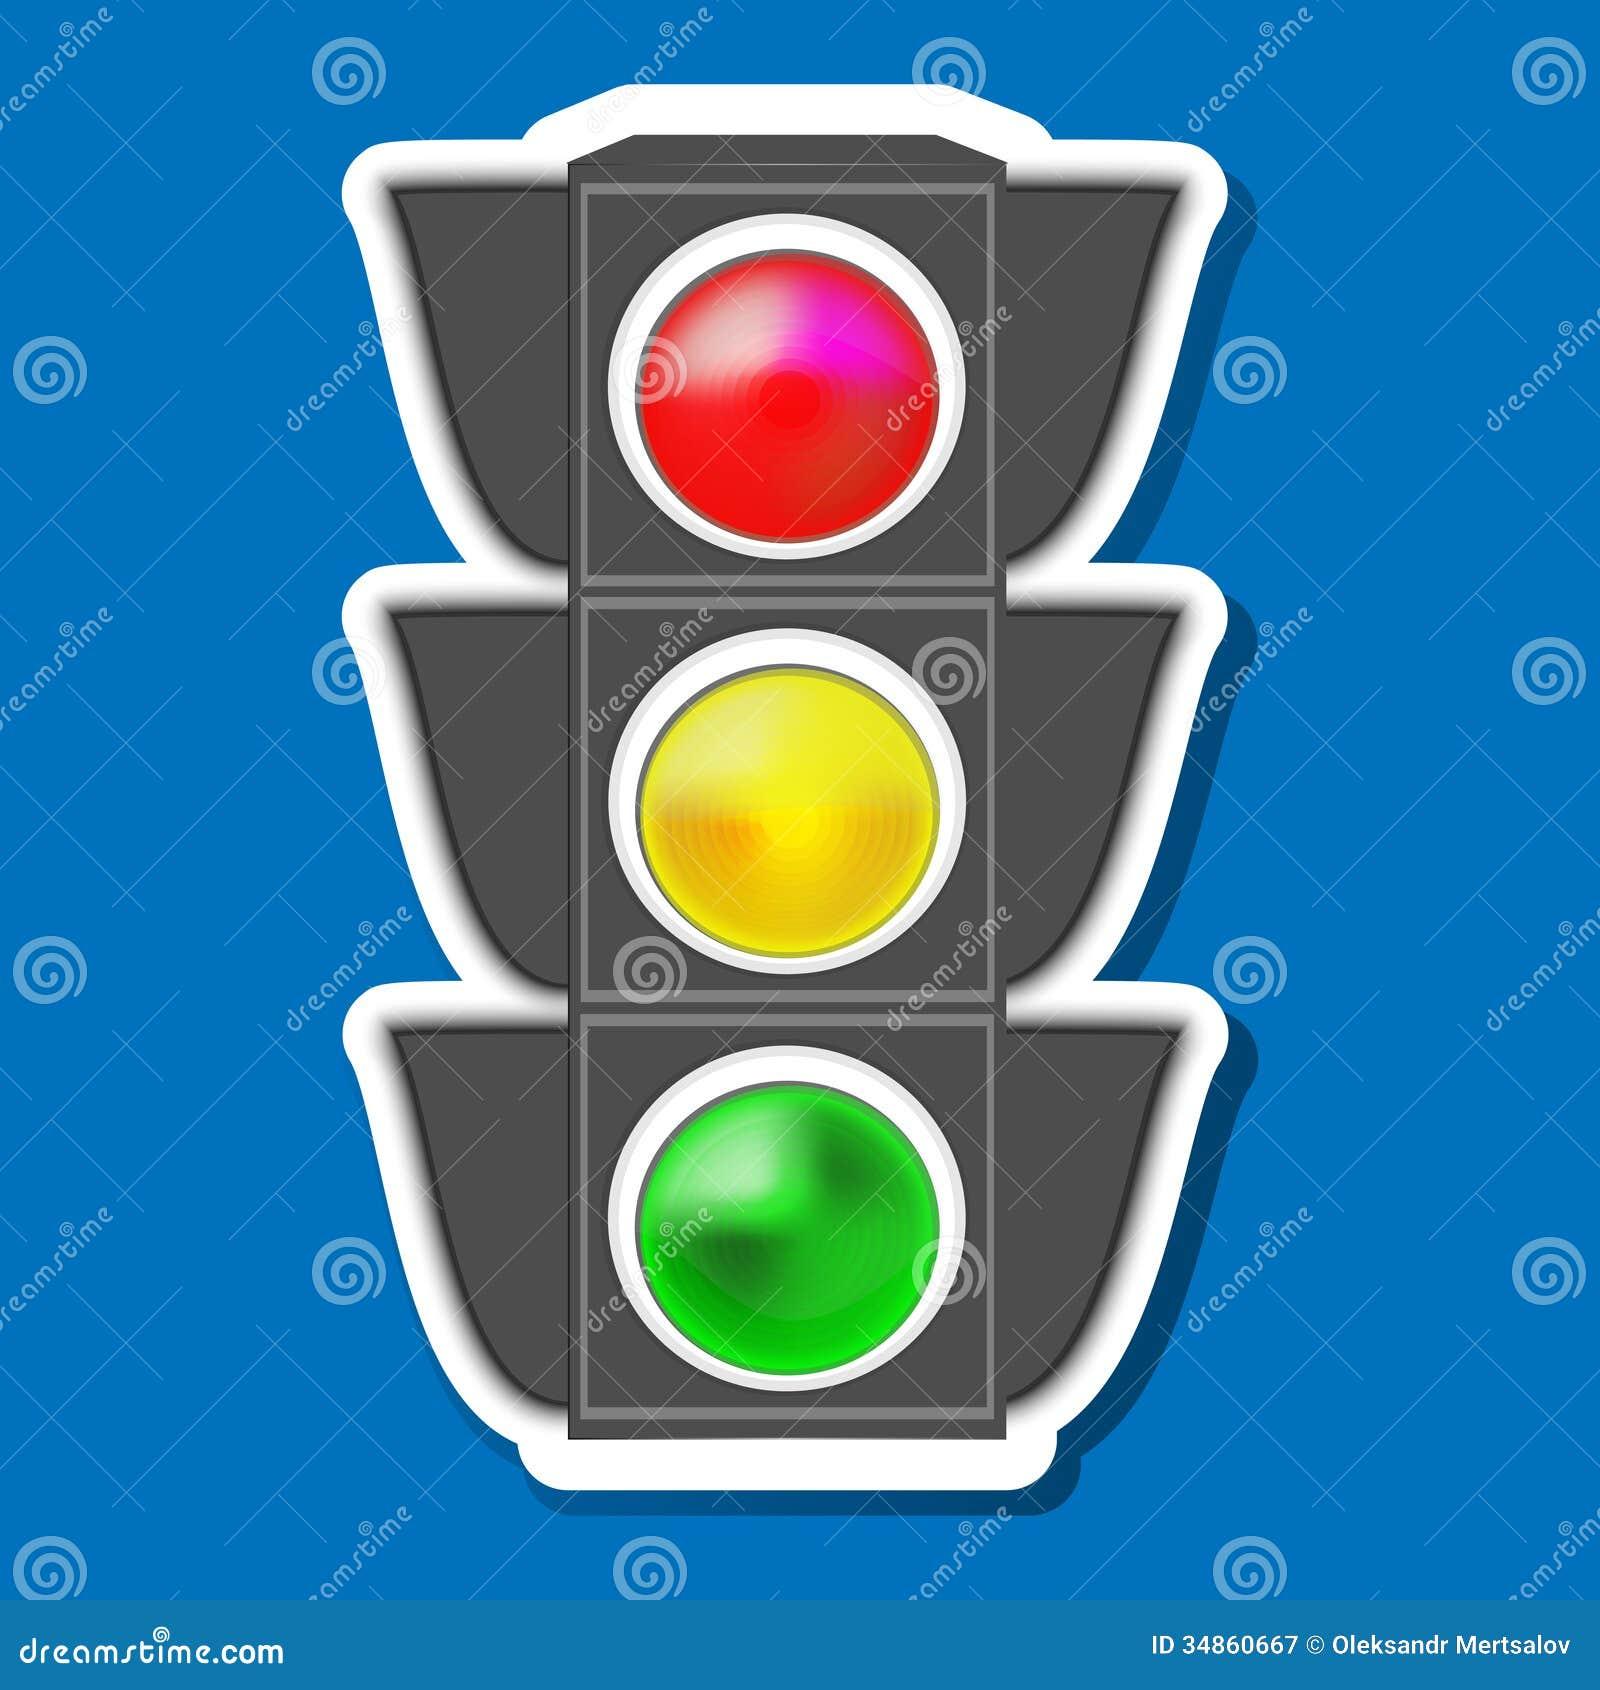 Traffic Light Stock Illustration Illustration Of Icon 34860667